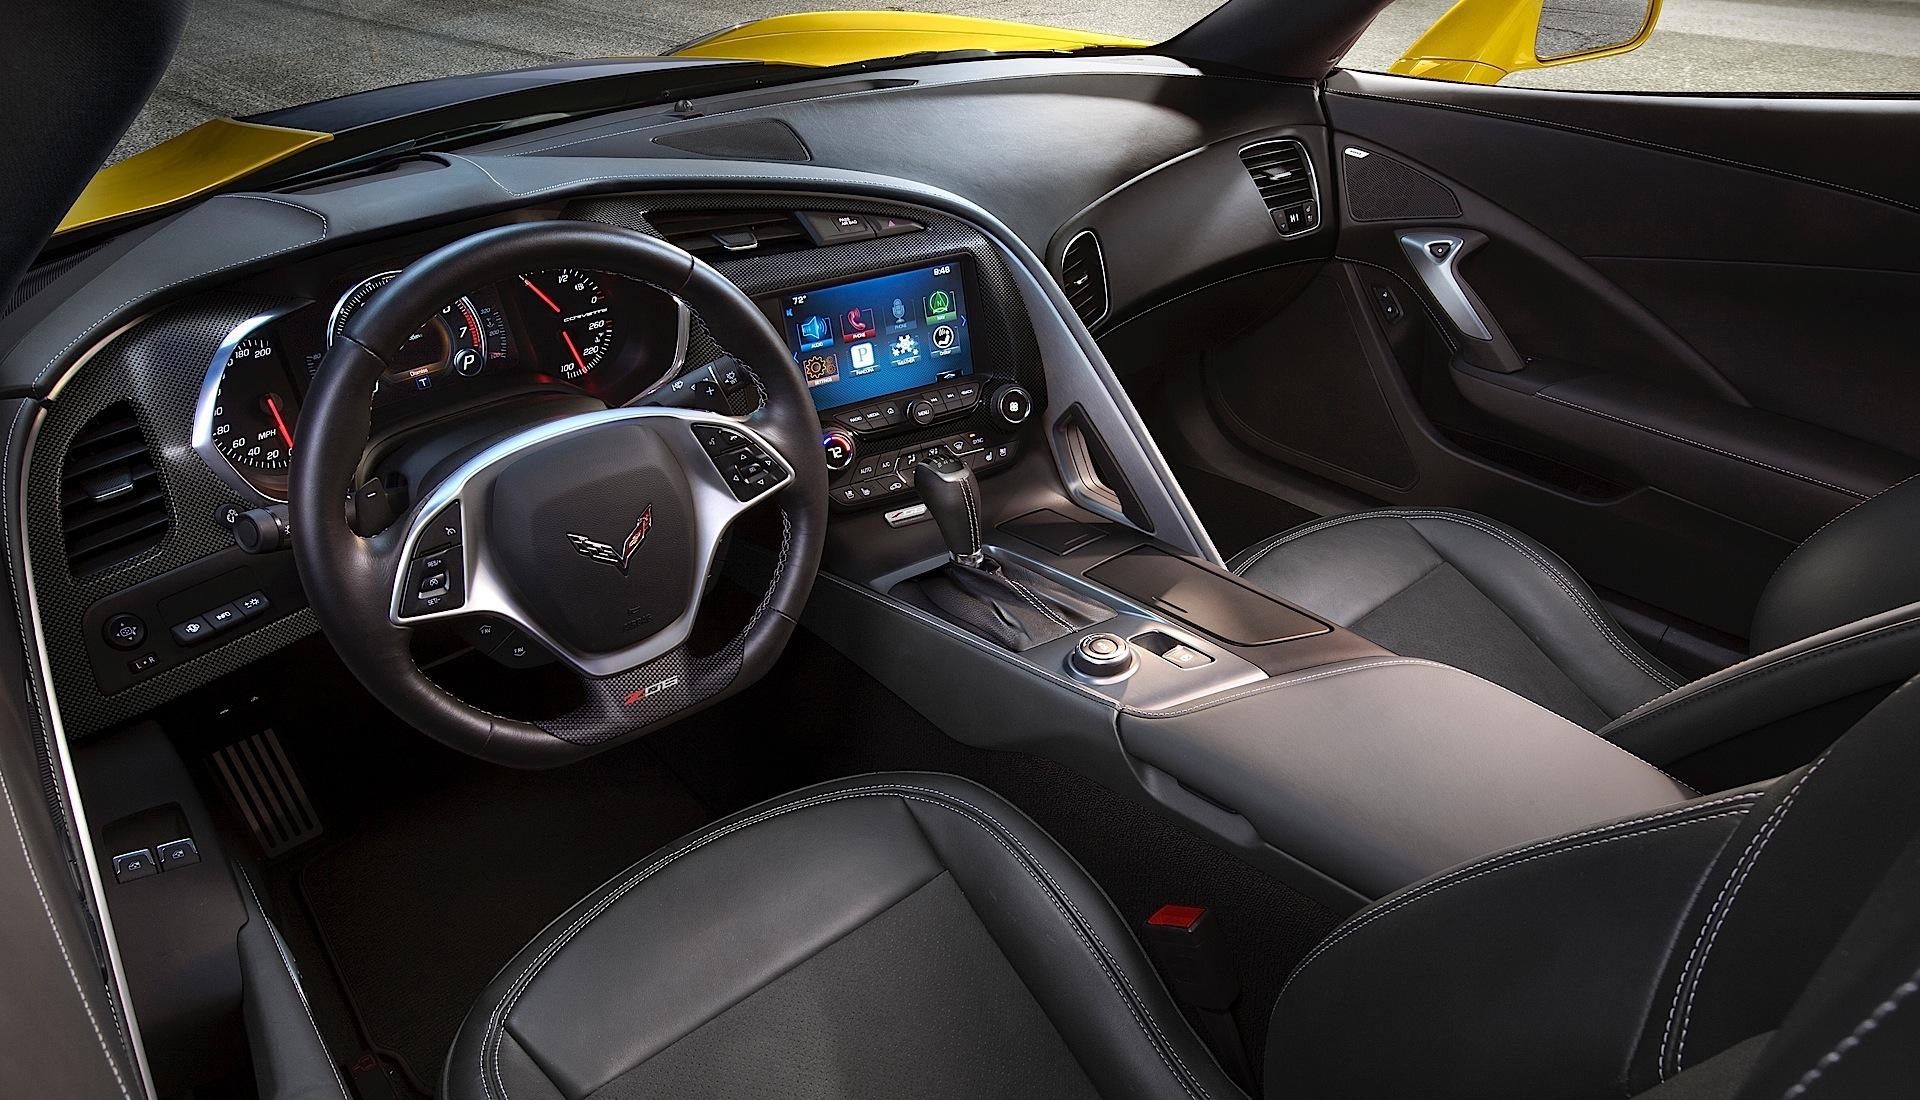 chevrolet corvette z06 2014 present white 2015 z06 picturesleadjpg - Corvette 2015 White